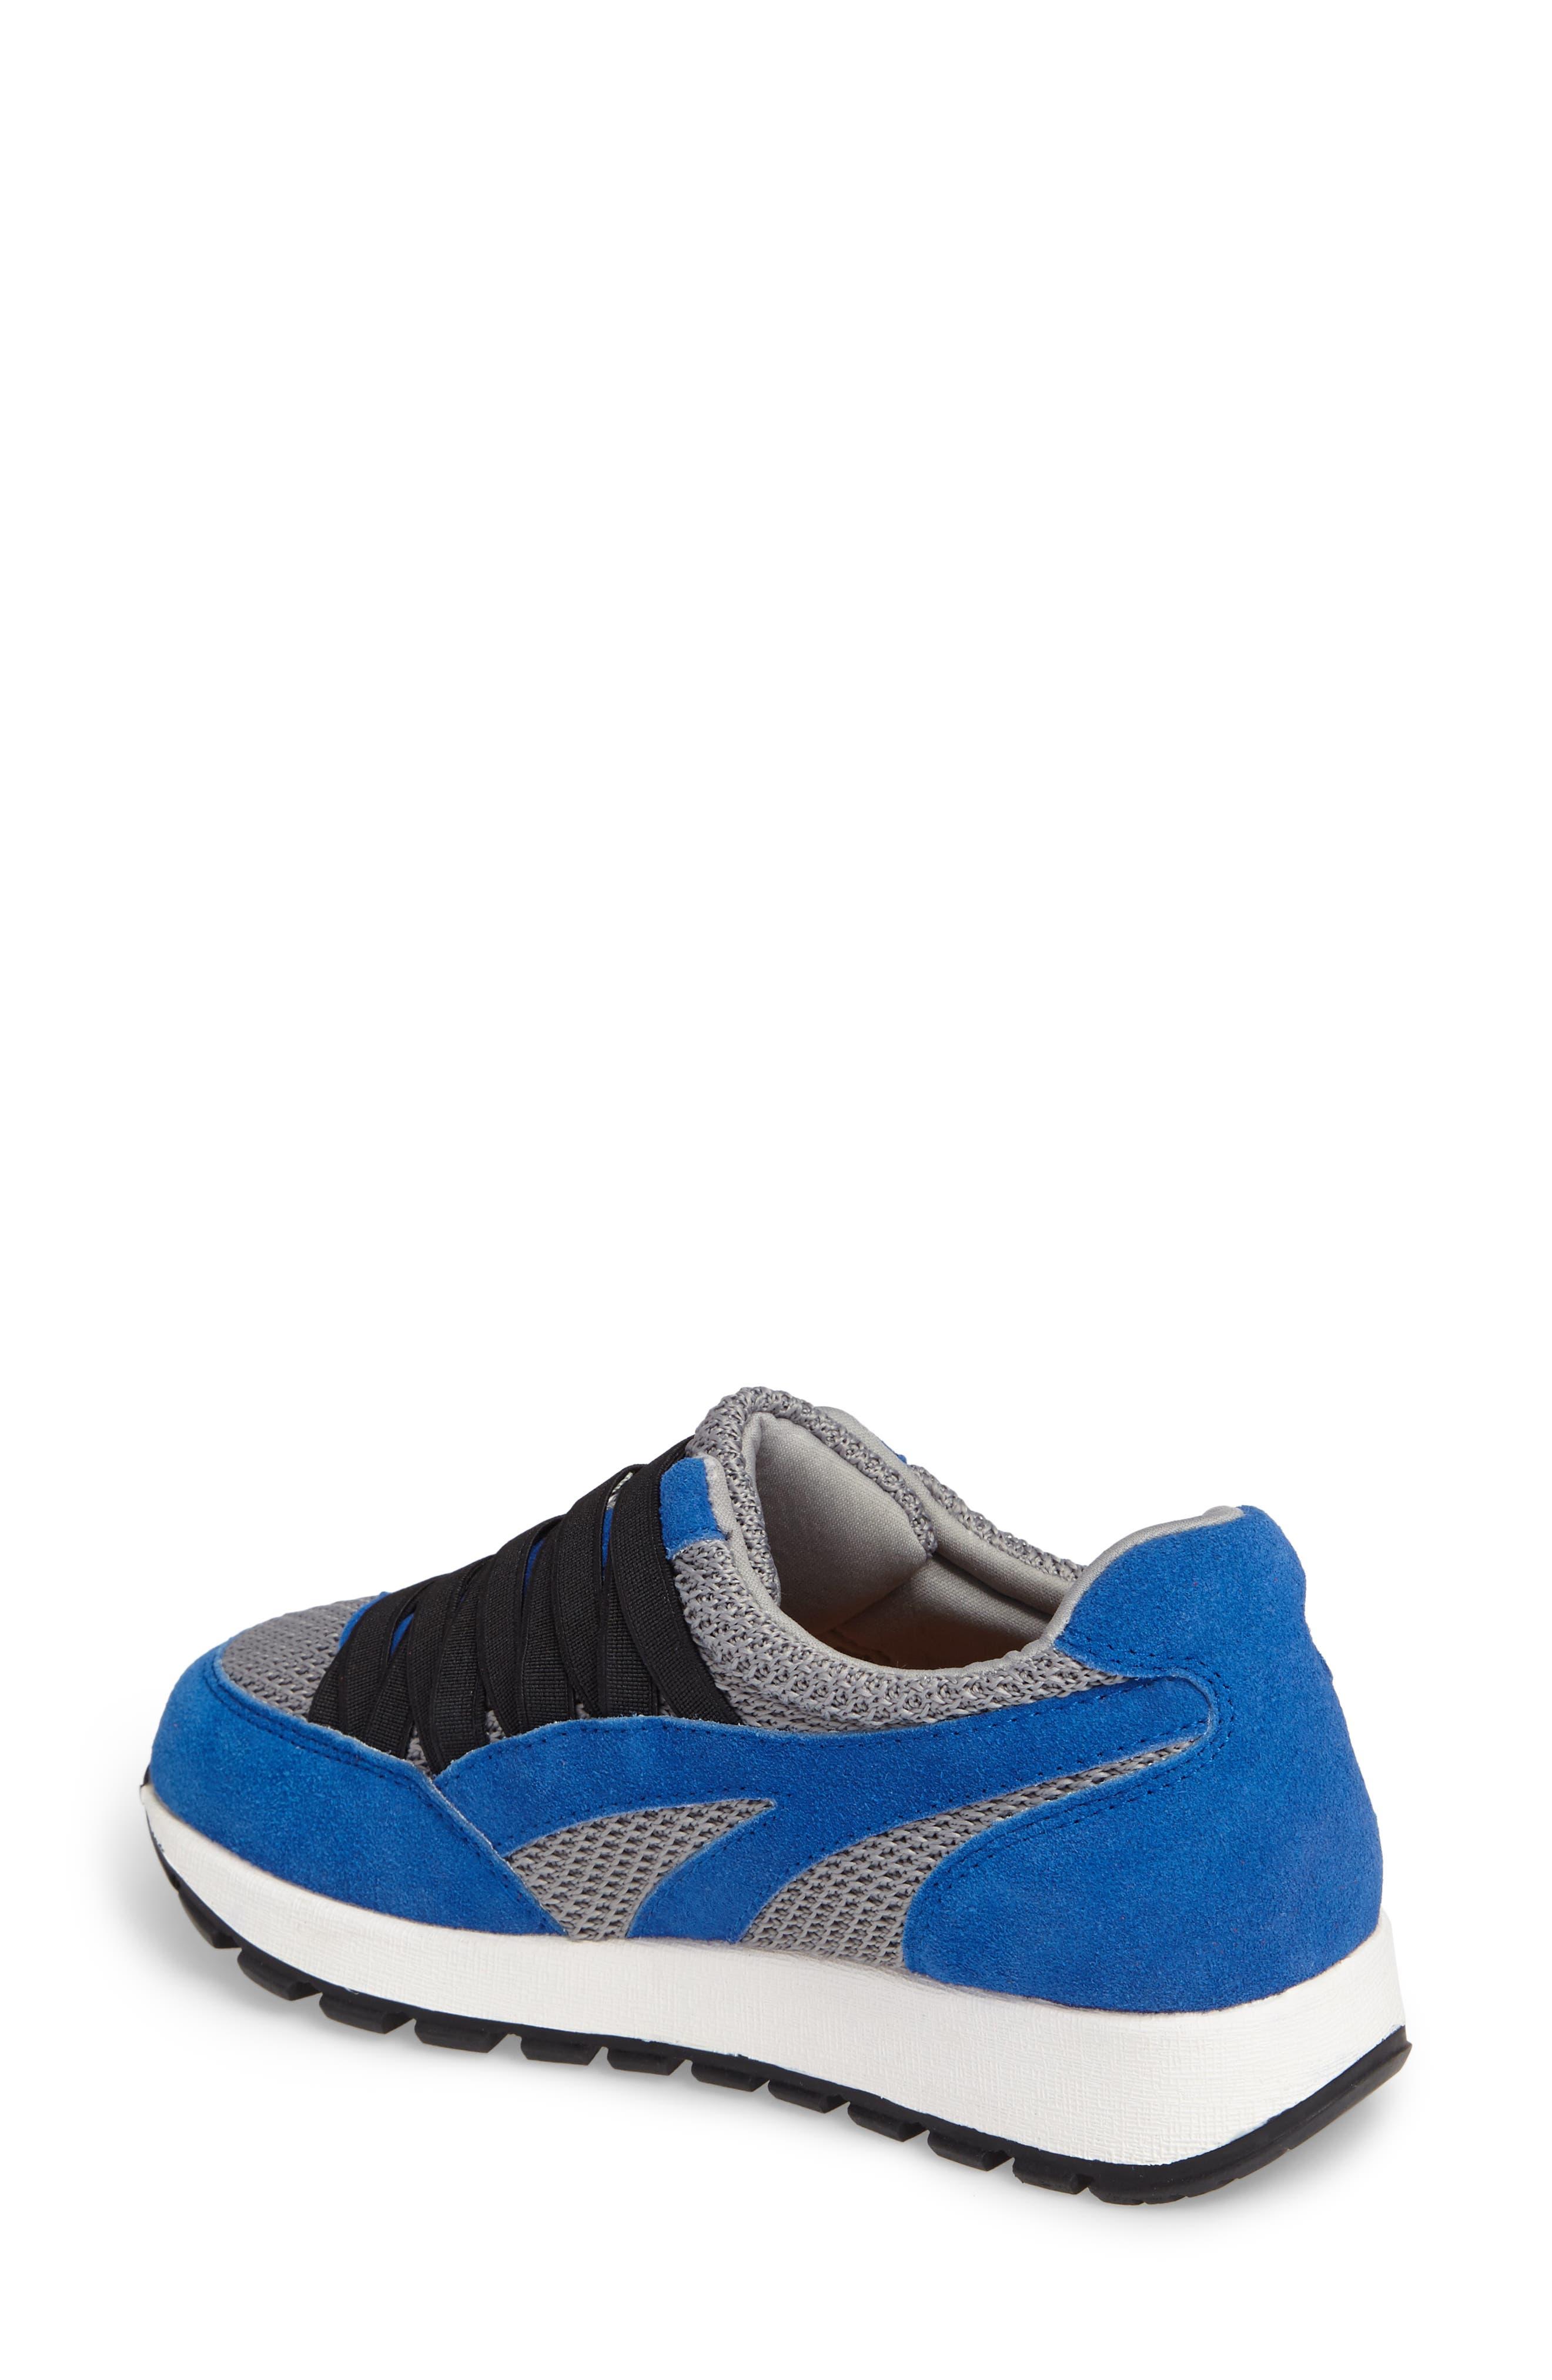 BERNIE MEV., Bernie Mev Tara Cano Sneaker, Alternate thumbnail 2, color, ROYAL BLUE/ GREY FABRIC